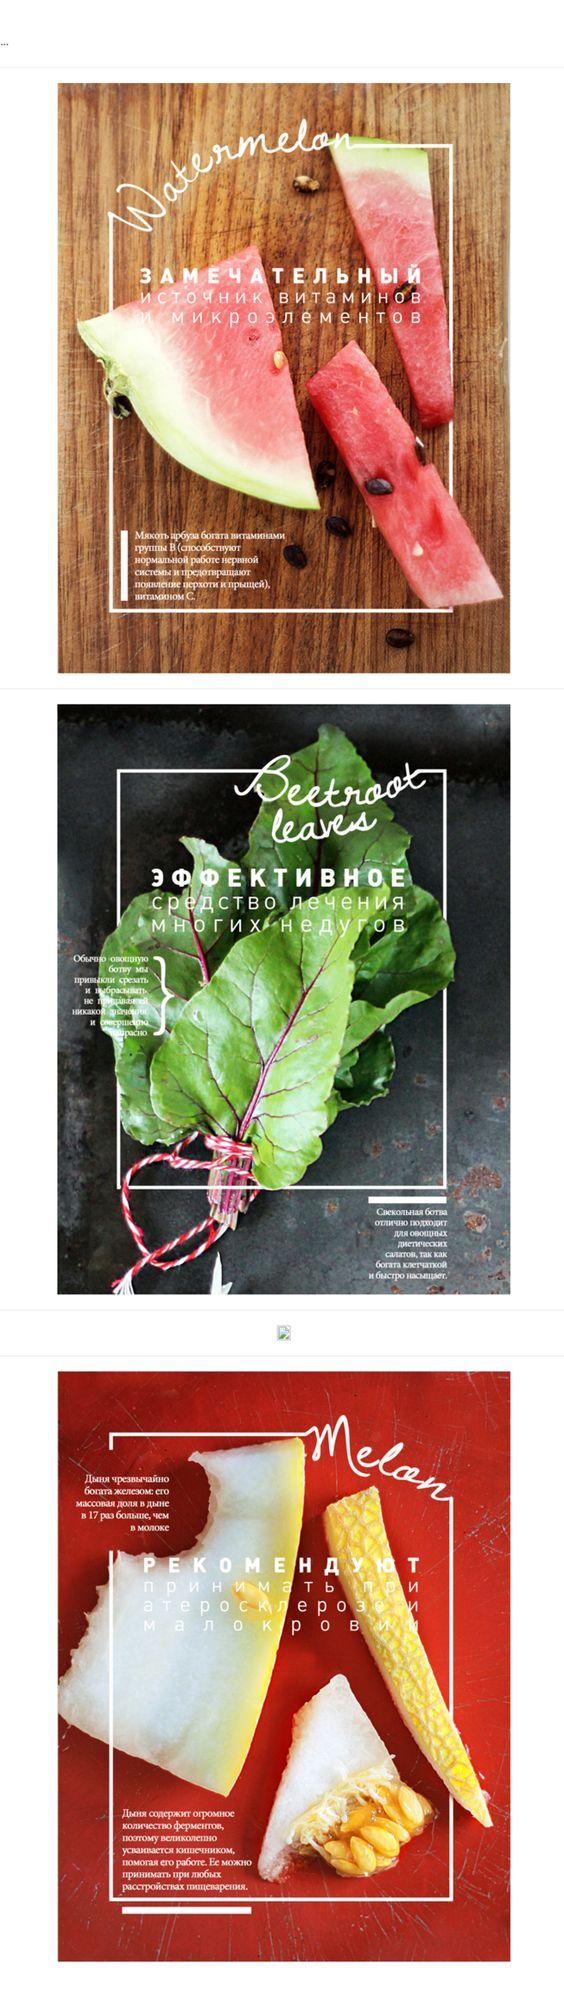 FOOD posters食品海报设计 文...: